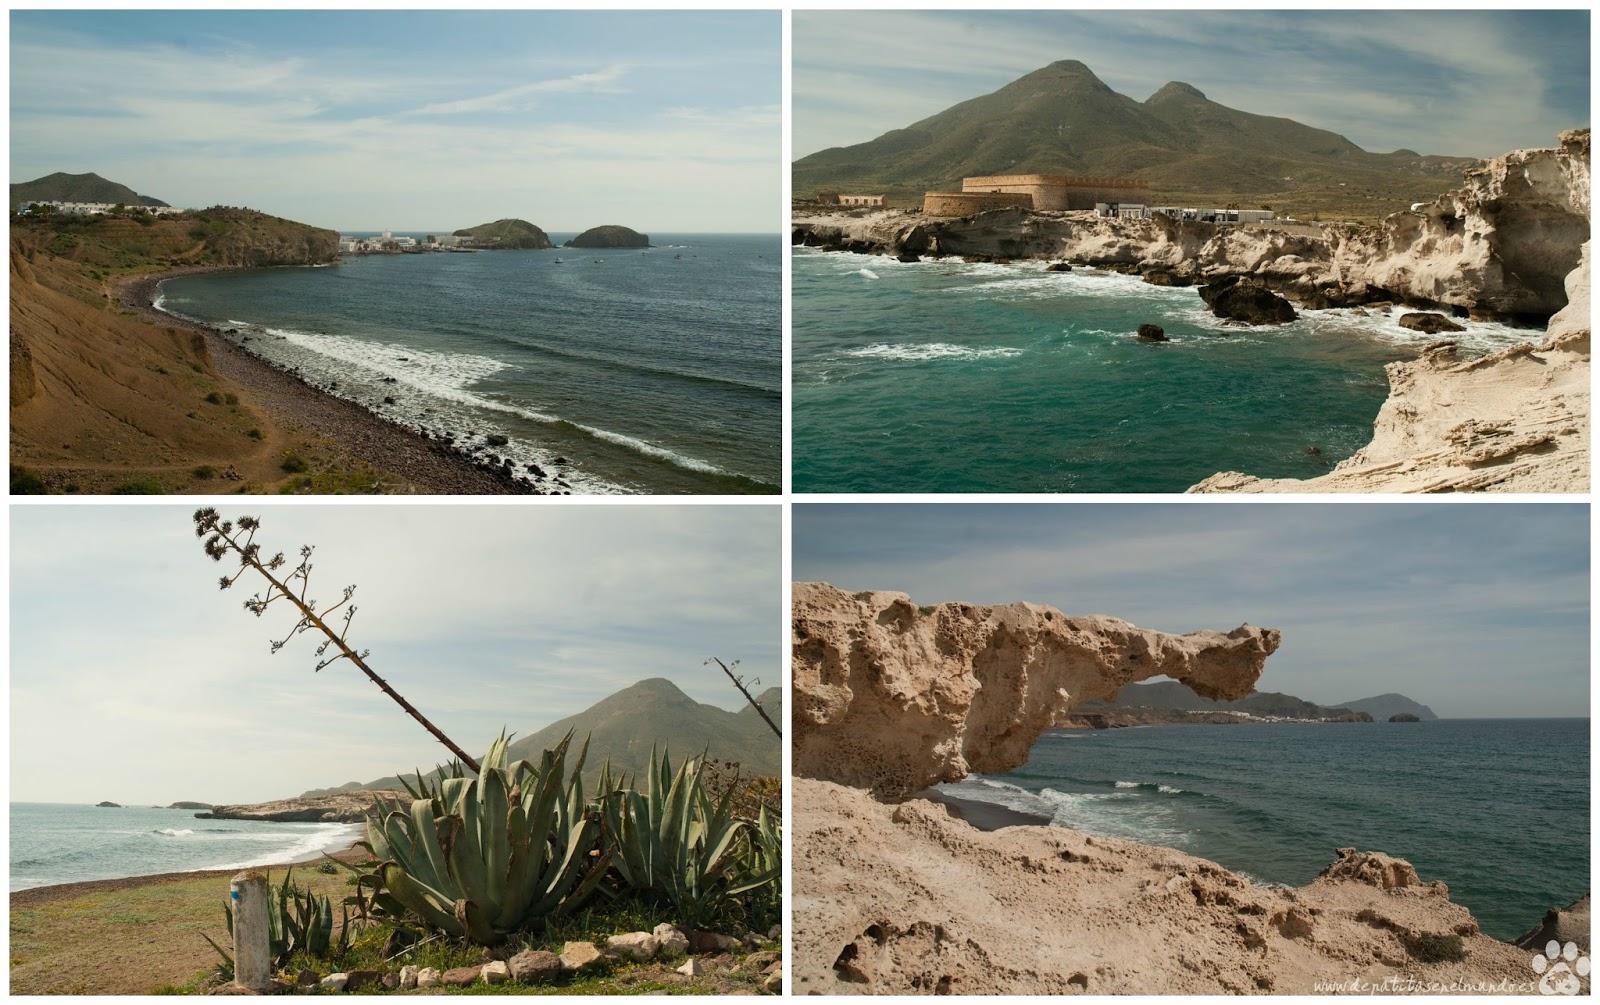 Ruta Isleta del Moro-Los Escullos, Cabo de Gata